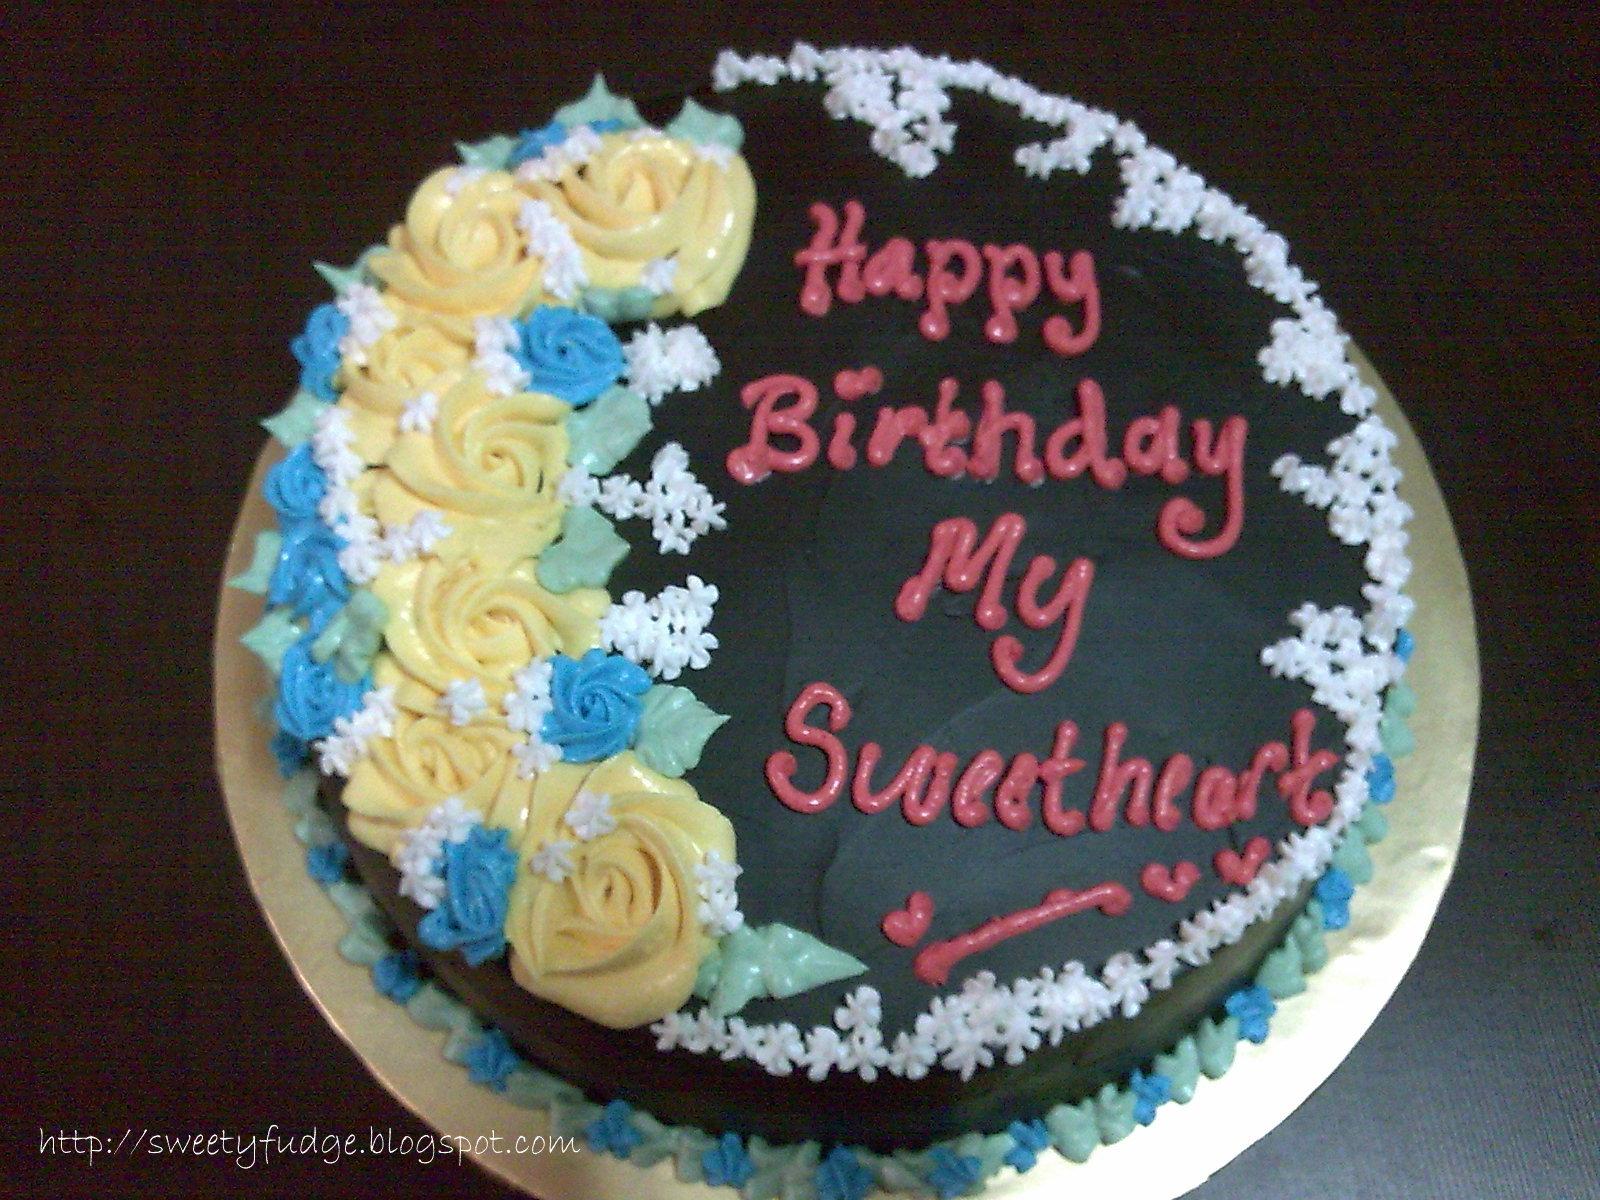 Sweetyfudge Bakery 001925672 X Happy Birthday My Sweetheart Rini